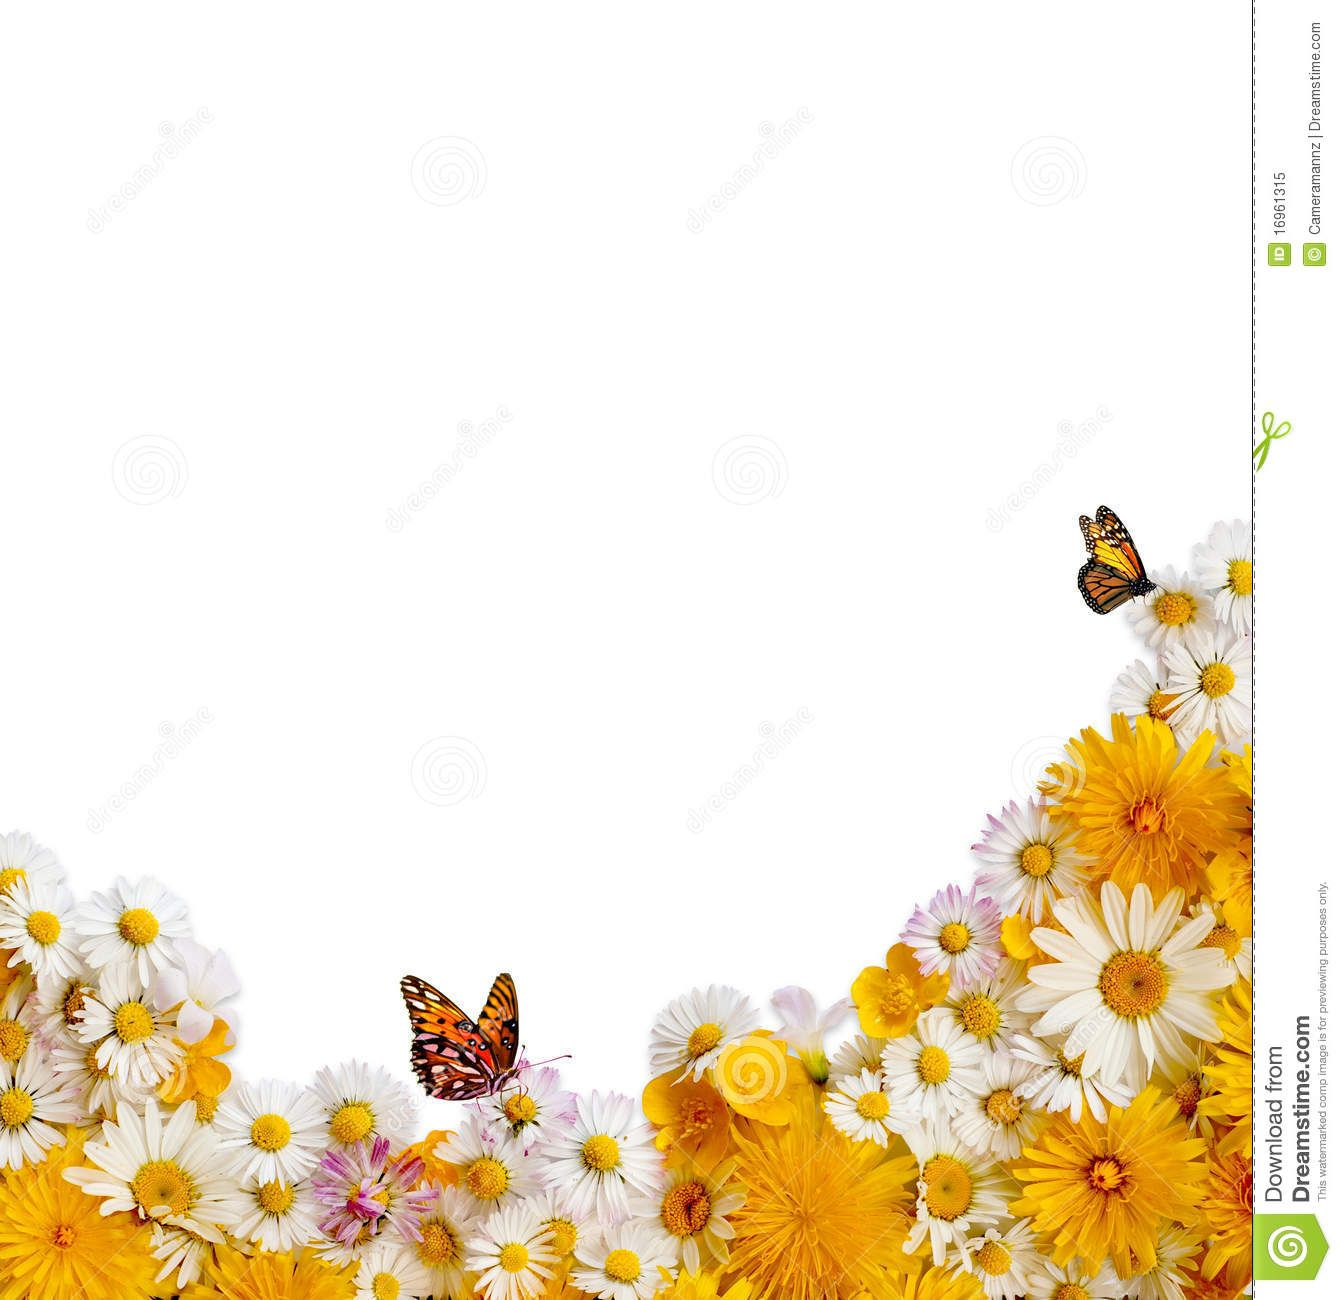 Spring Flowers Clip Art Borders.